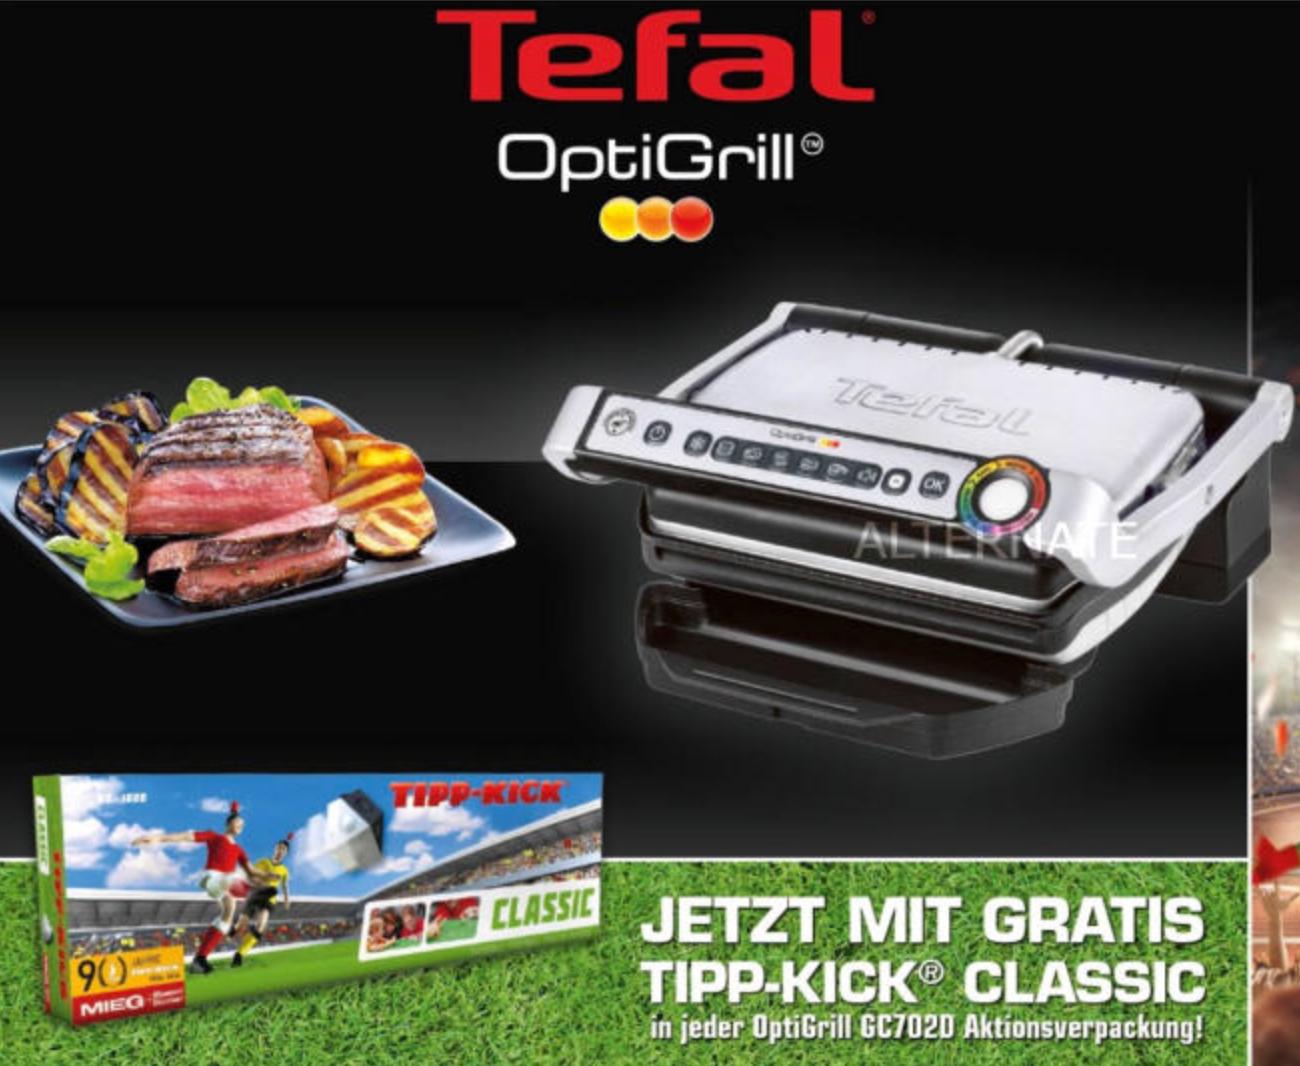 [Alternate] Tefal Optigrill GC 702D mit TIPP-KICK CLASSIC für 77,89€ inkl. Versandkosten mit MasterPass